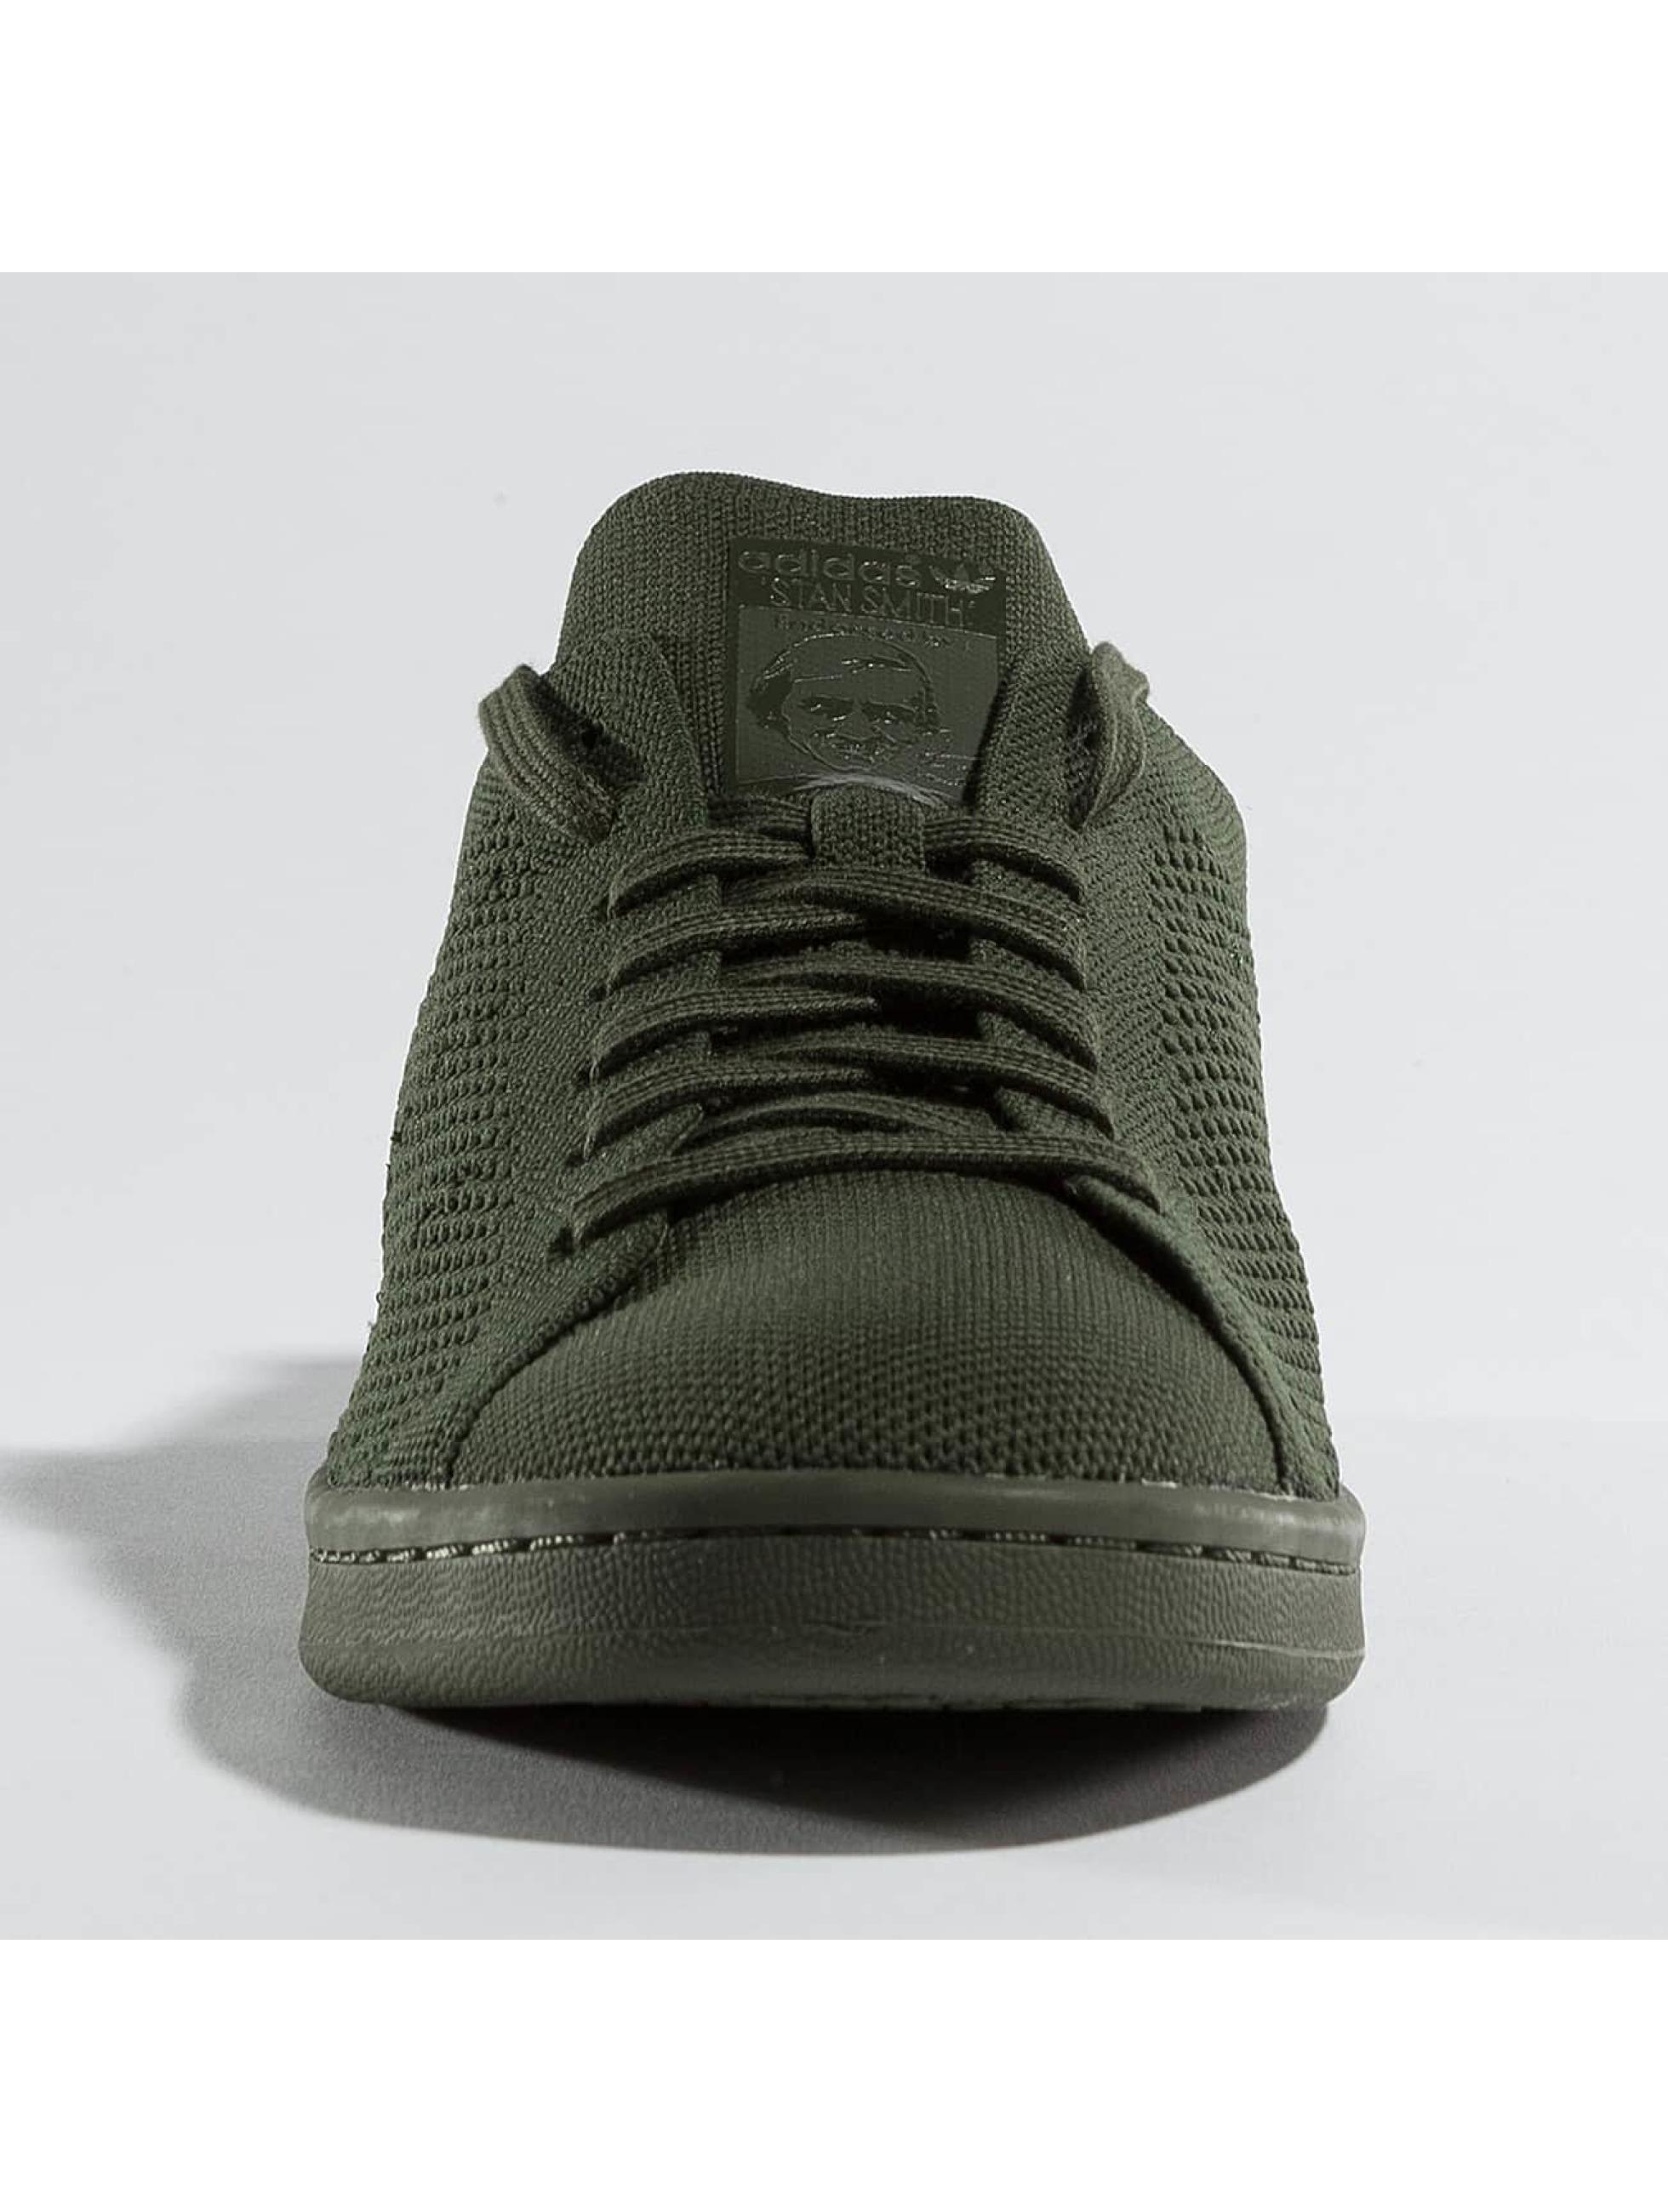 adidas originals Sneakers Stan Smith PK olive